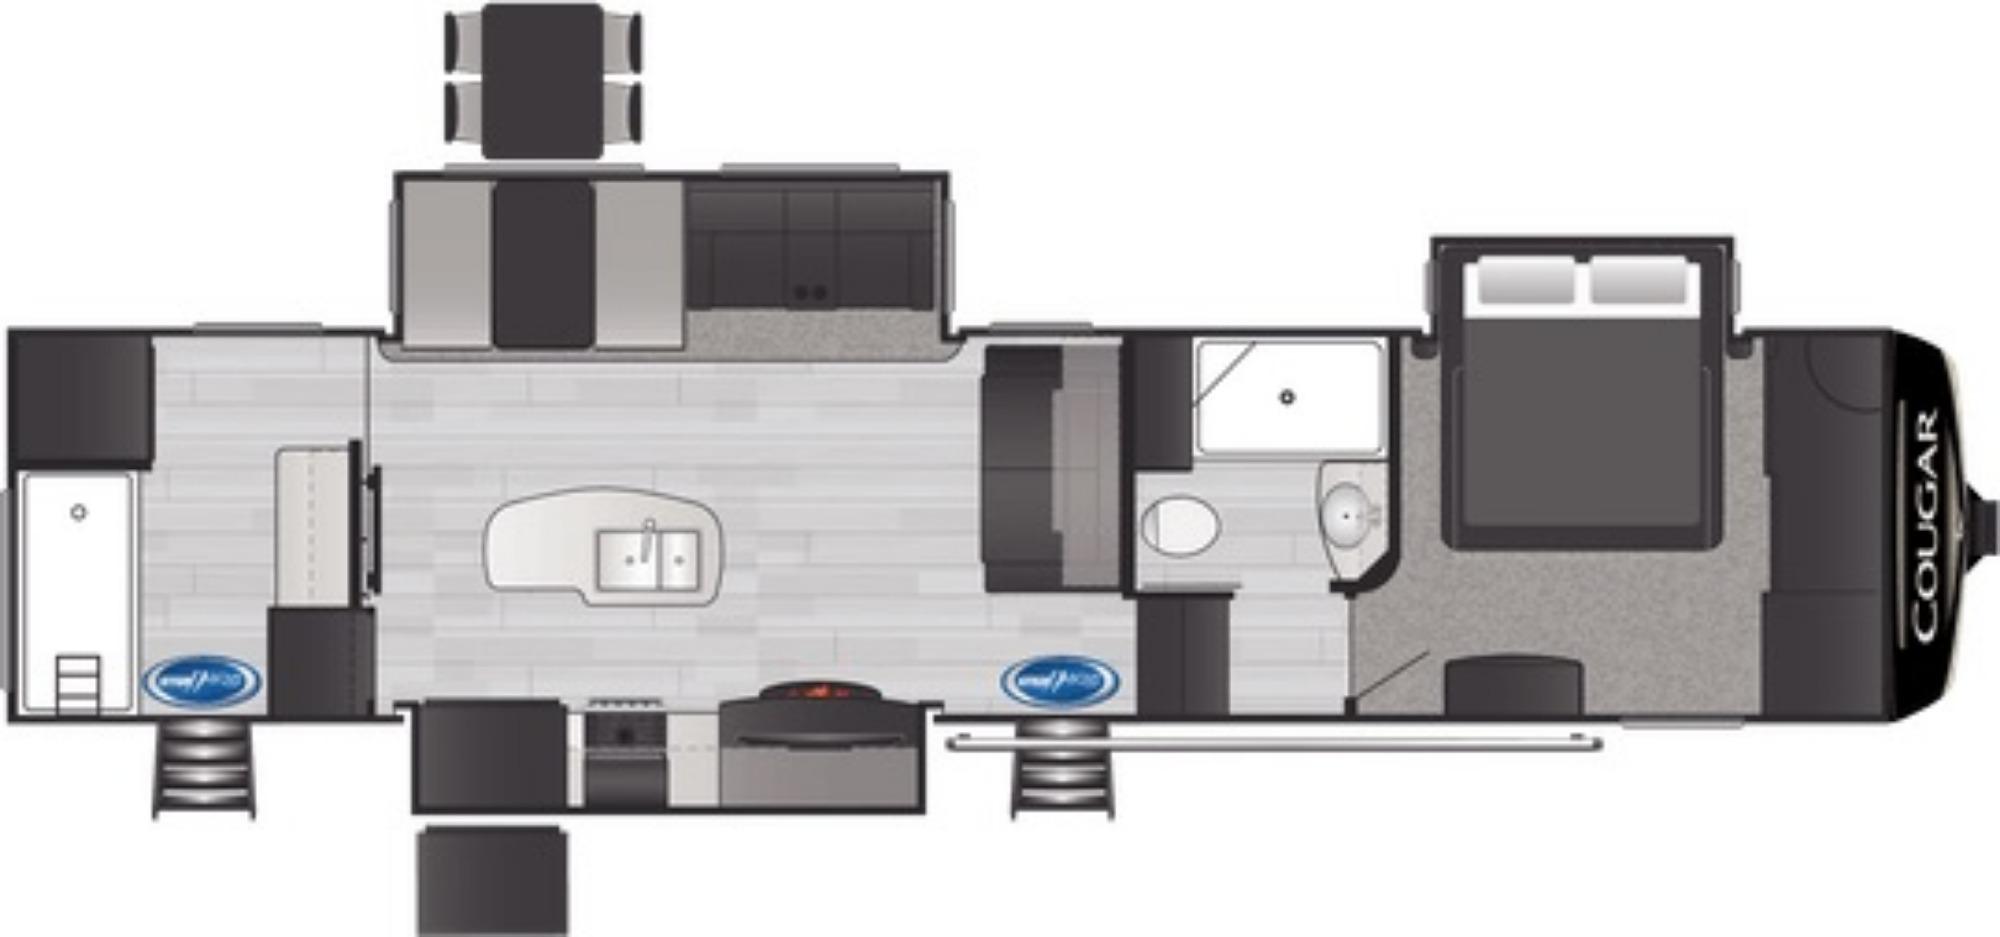 View Floor Plan for 2021 KEYSTONE COUGAR 357UMR